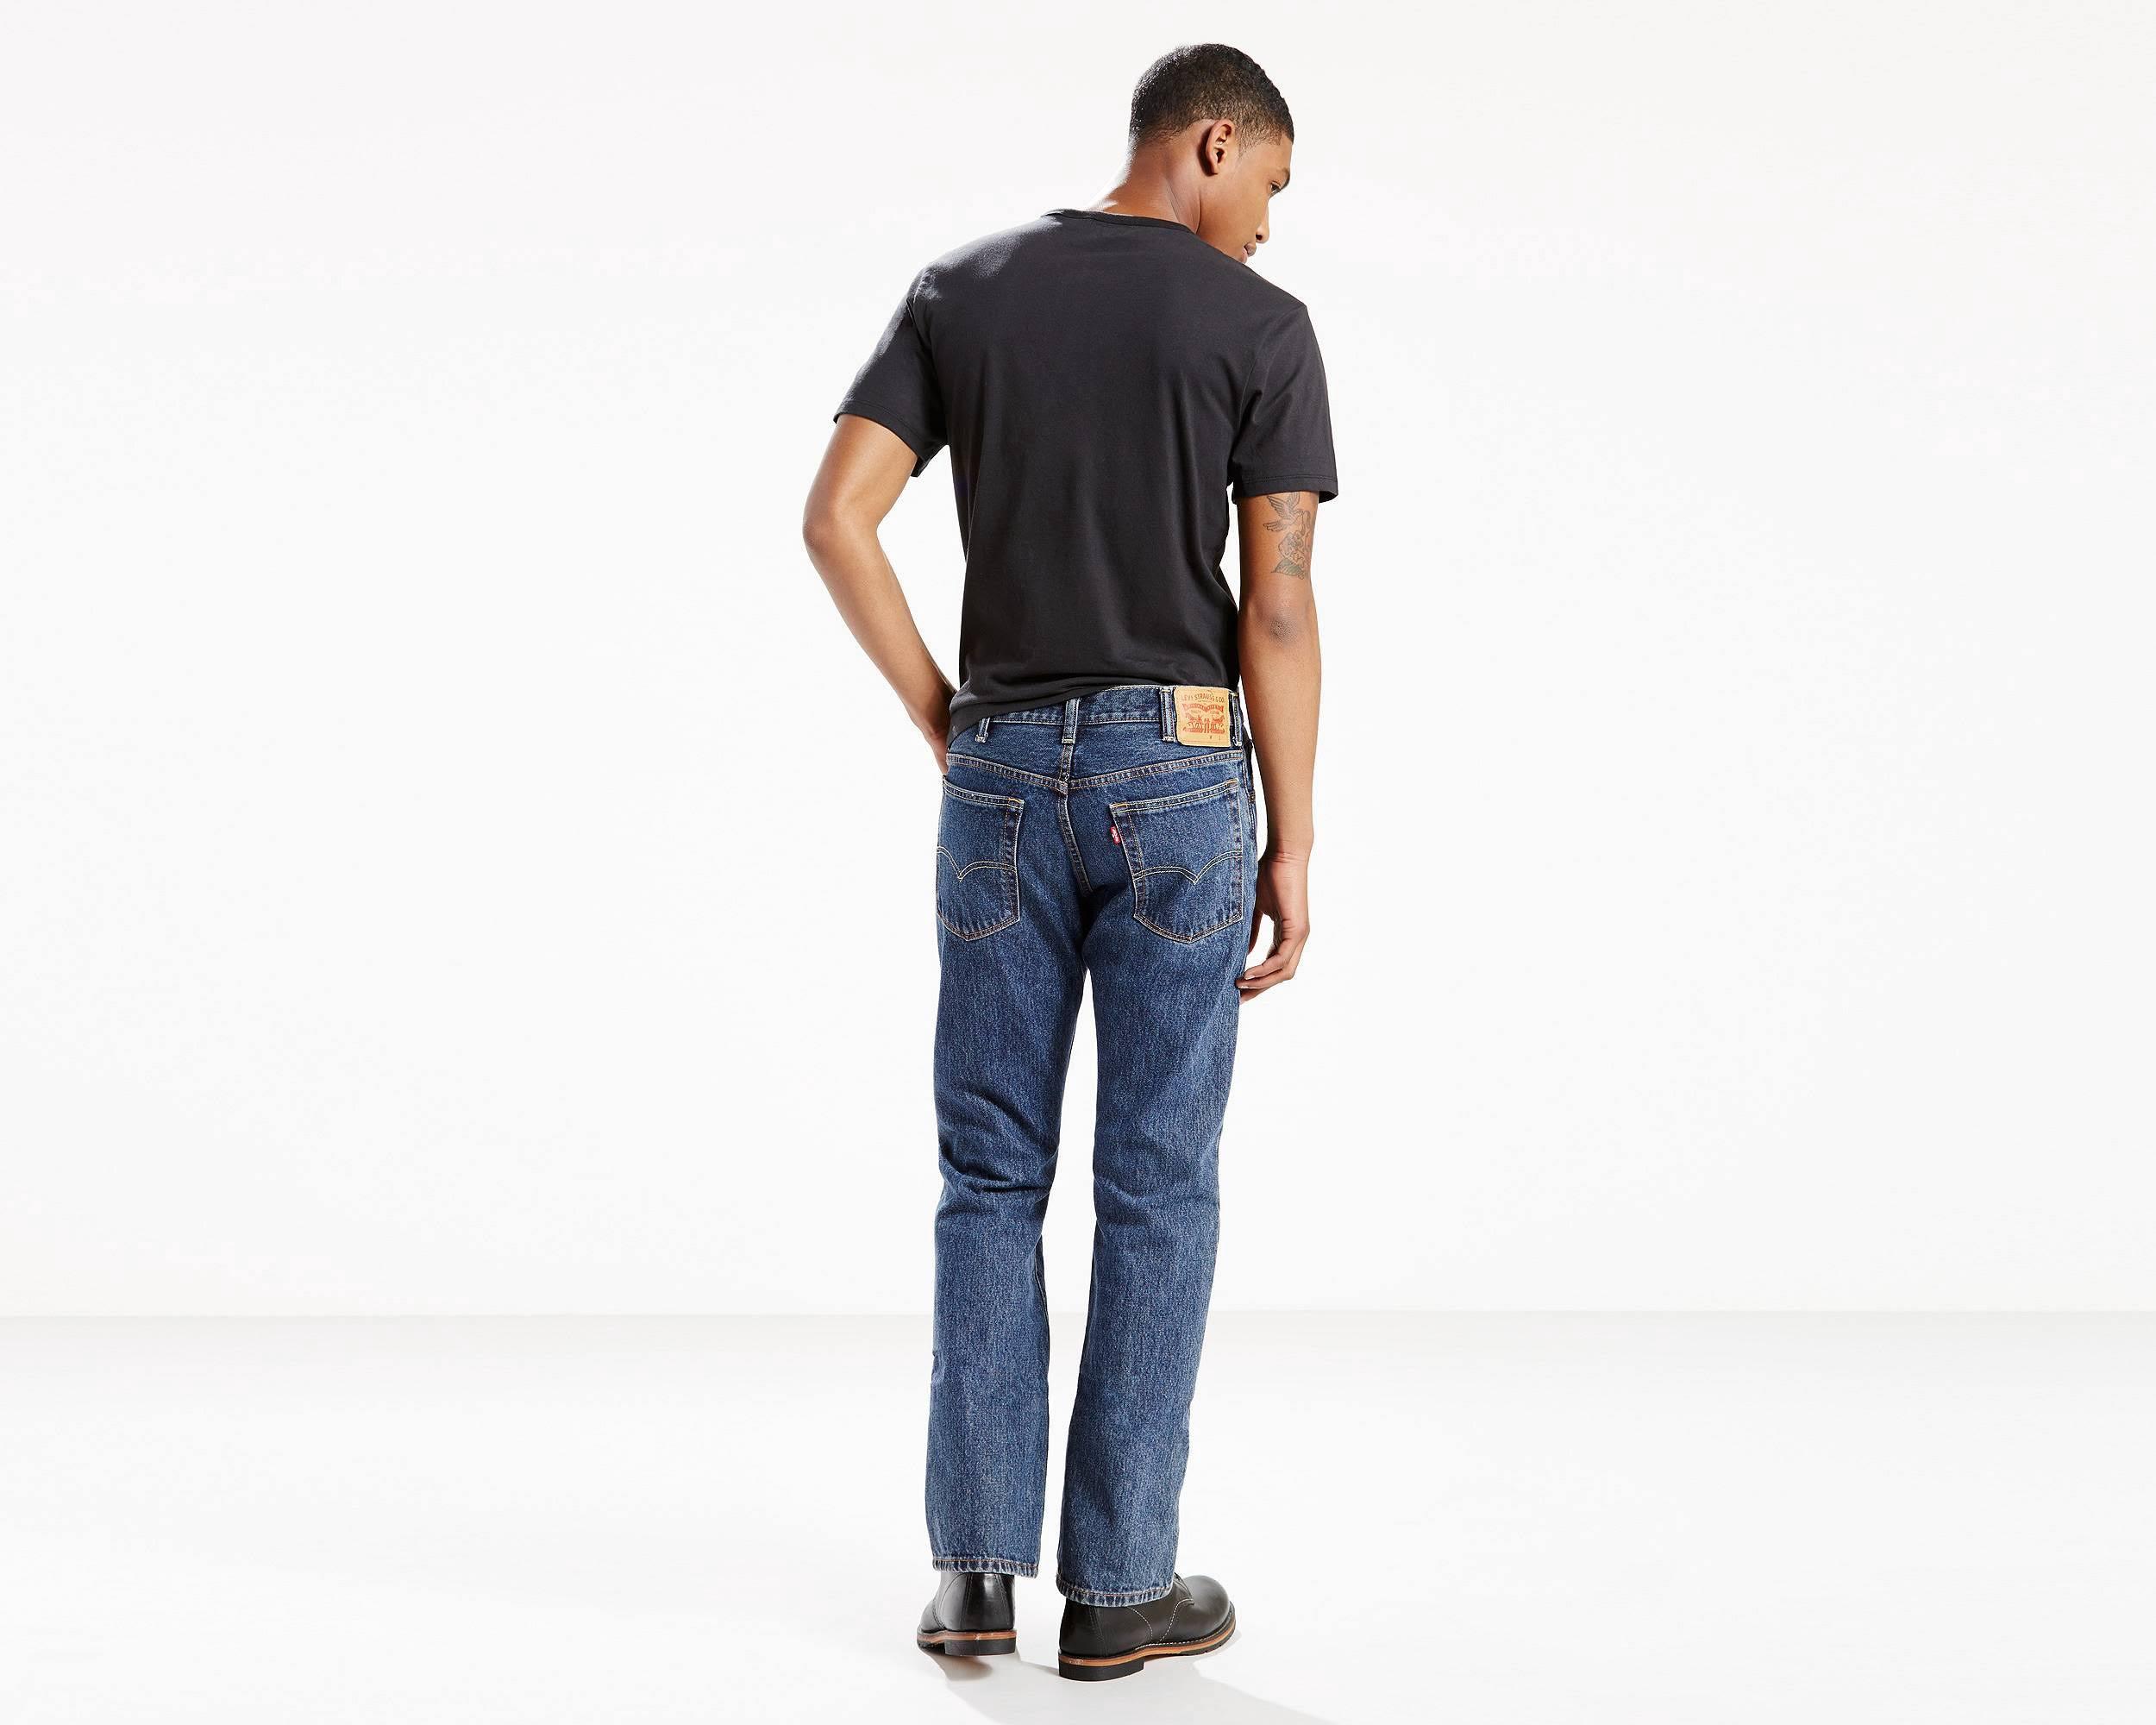 Dark Boot Jeans 35 Cut 517 Stonewash Levi's 34 6cFWPTaqPn